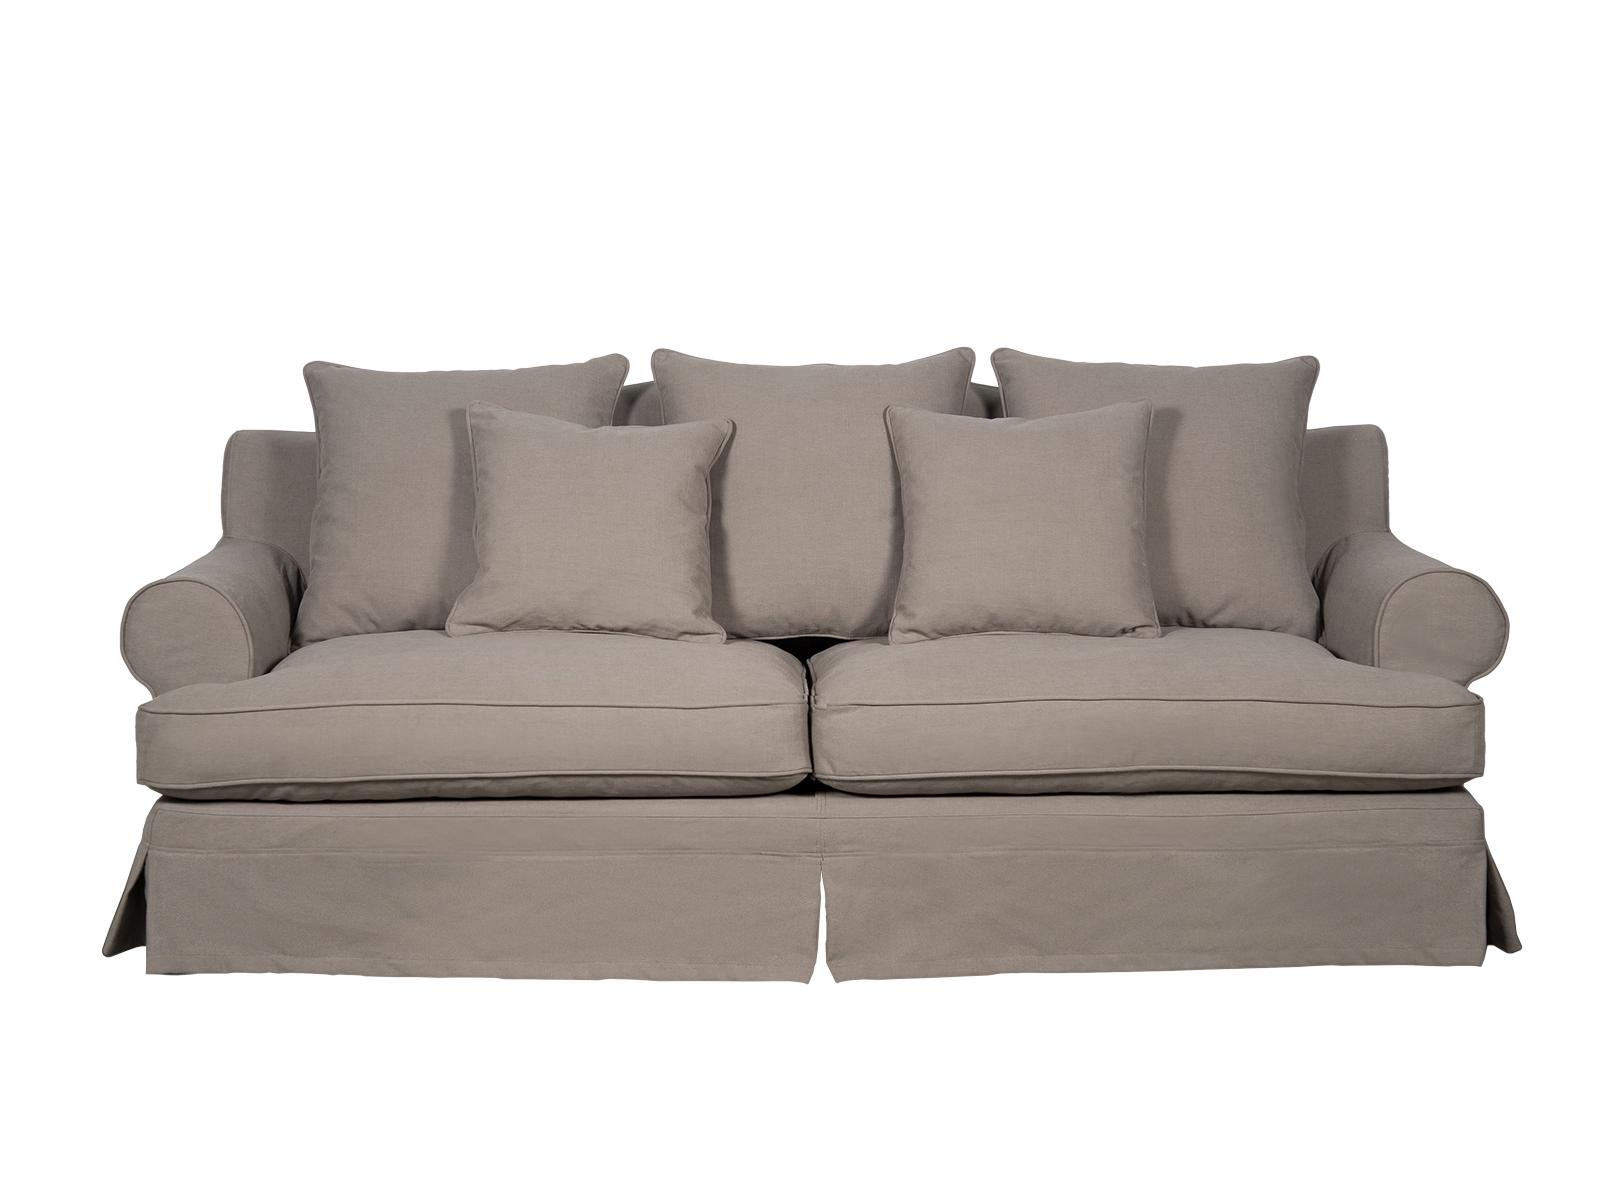 Canapea fixa 3 locuri Lucerne Brown